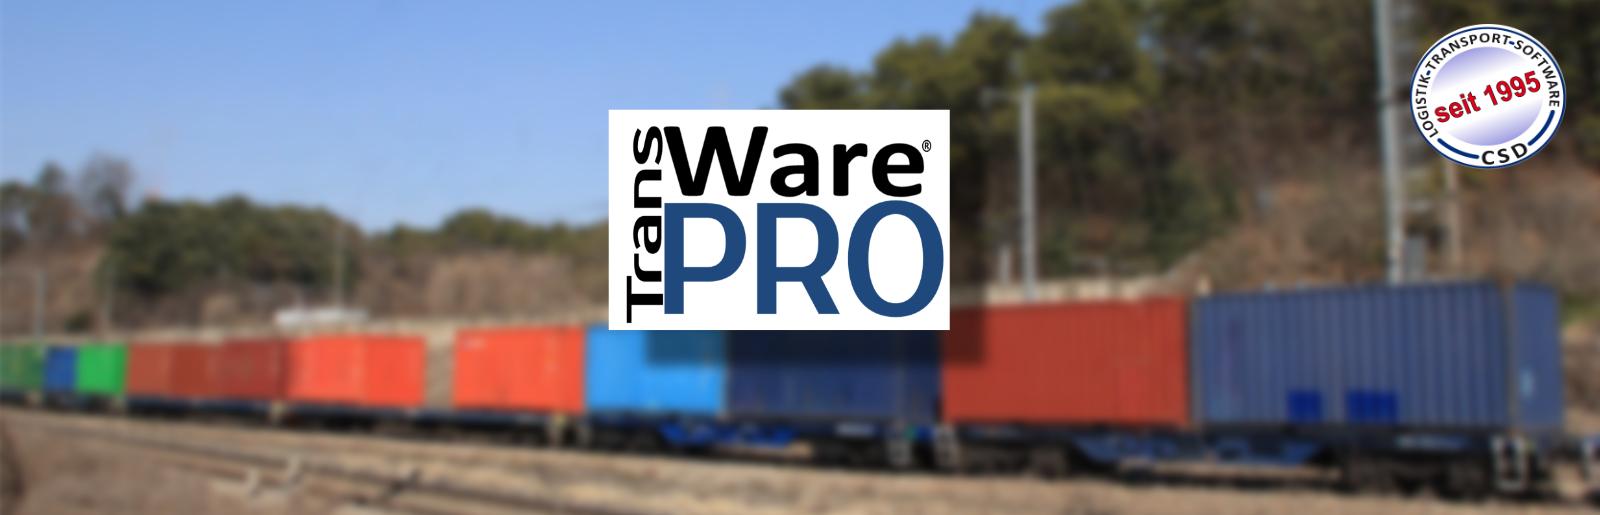 Eisenbahnverkehrsunternehmen EVU von CSD Logistik und Transport Software